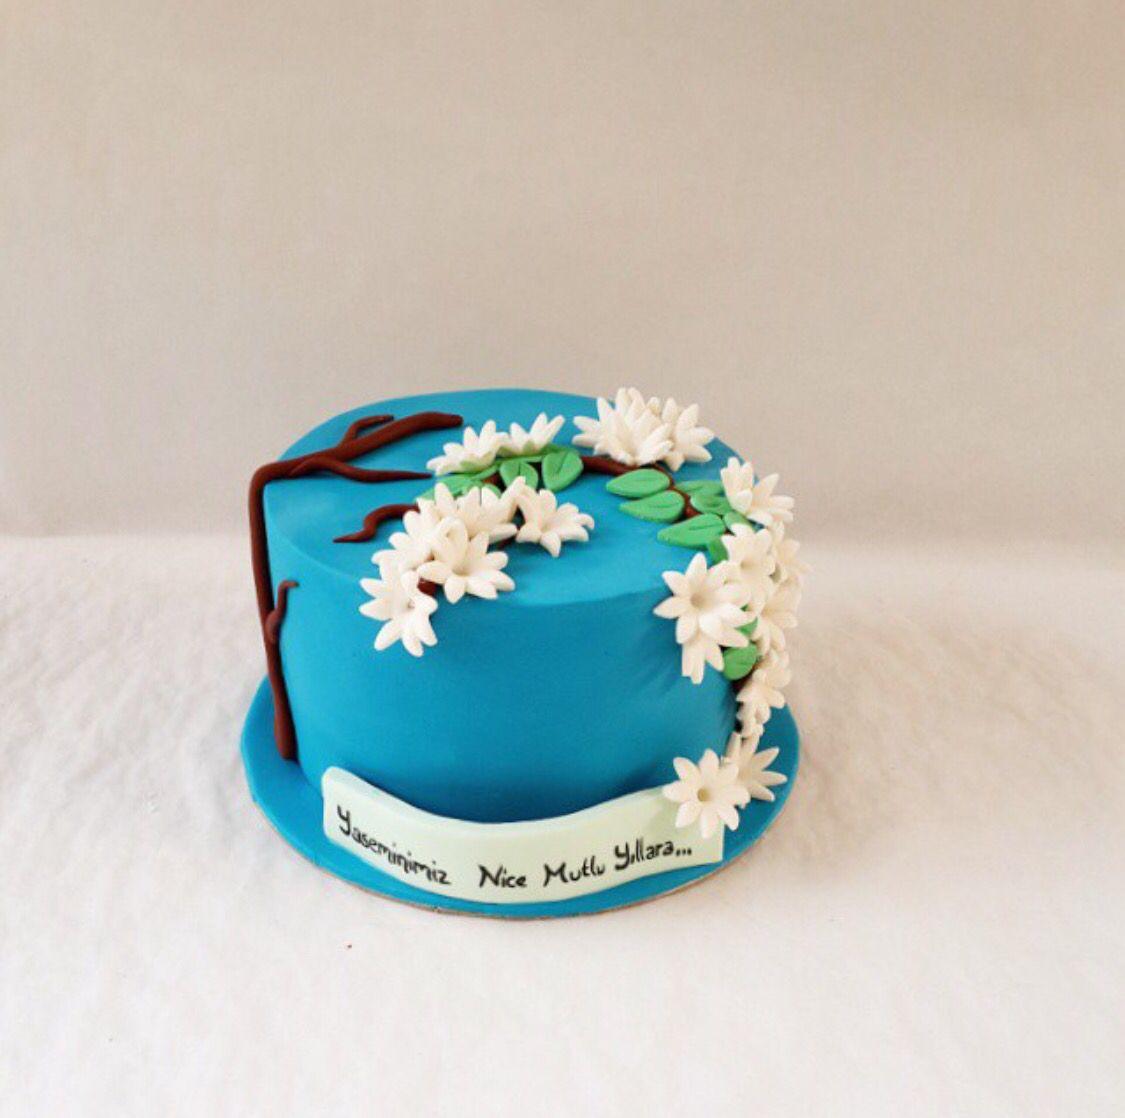 Jasmine jasmin cake blue birthday cake chocolate fondant cake